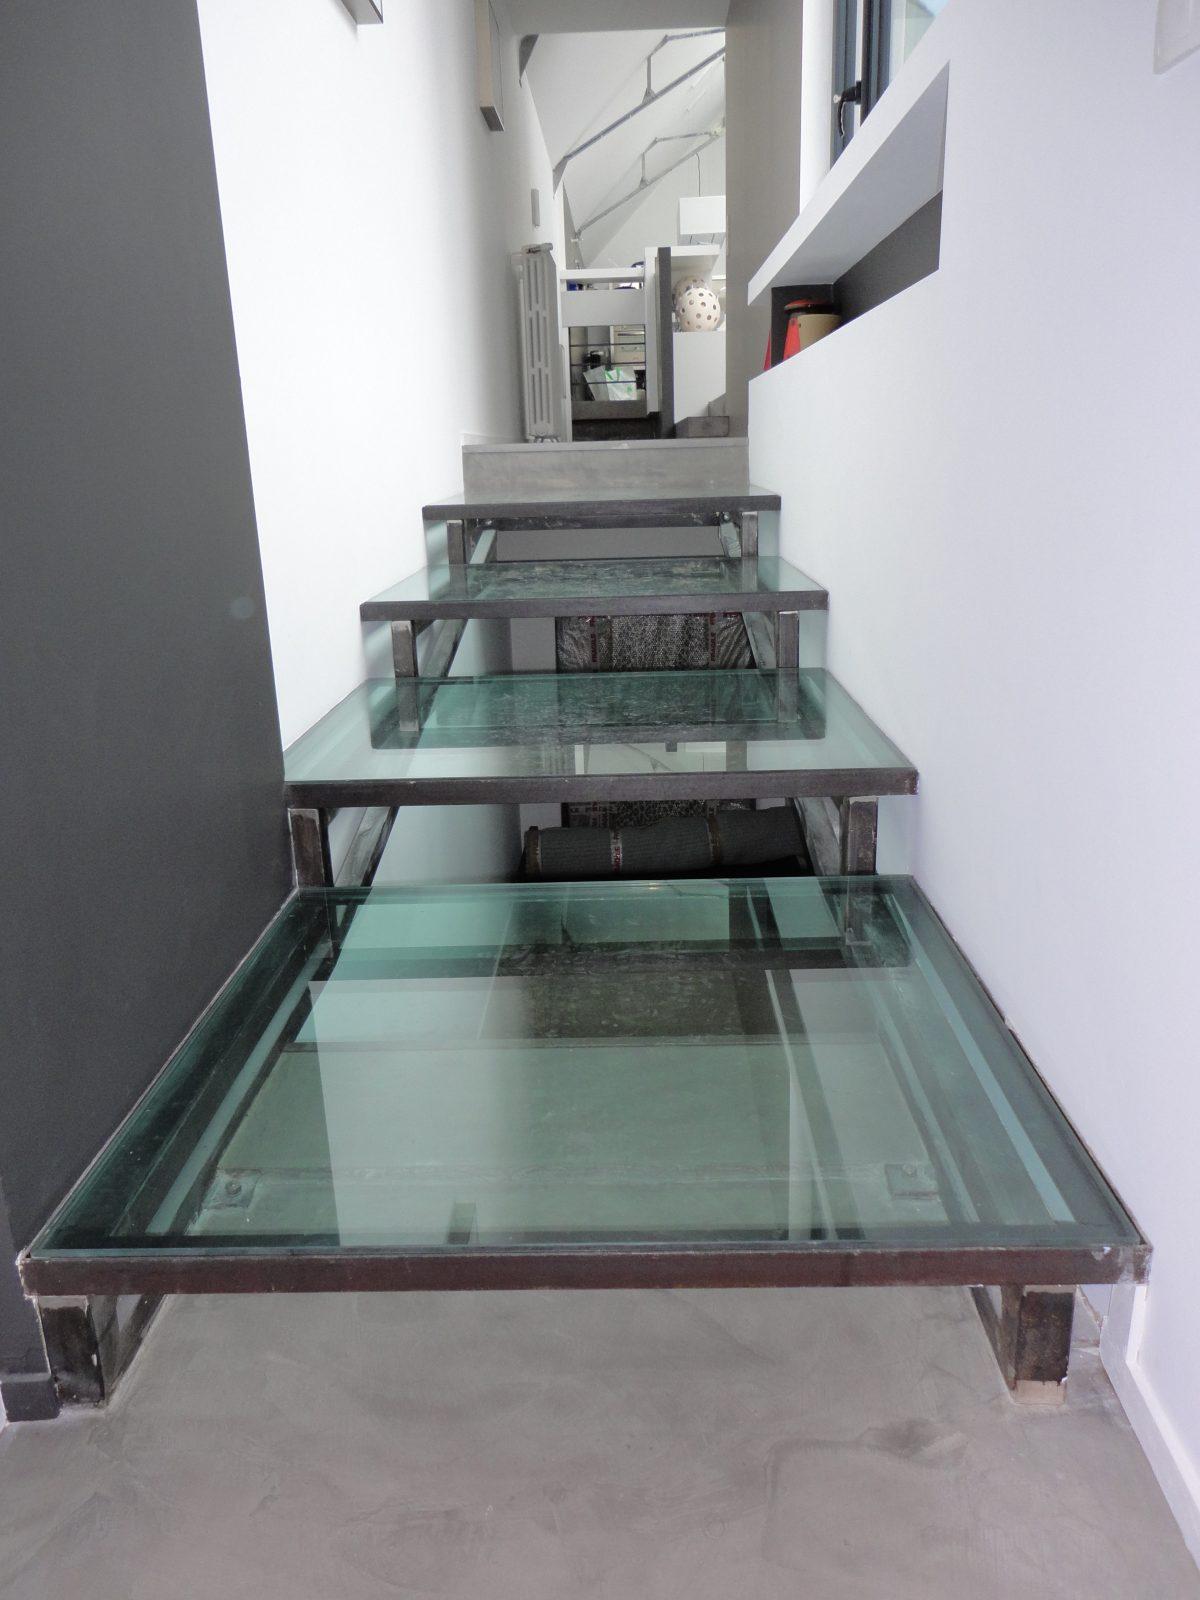 escalier tube carr marches en verre hagane. Black Bedroom Furniture Sets. Home Design Ideas